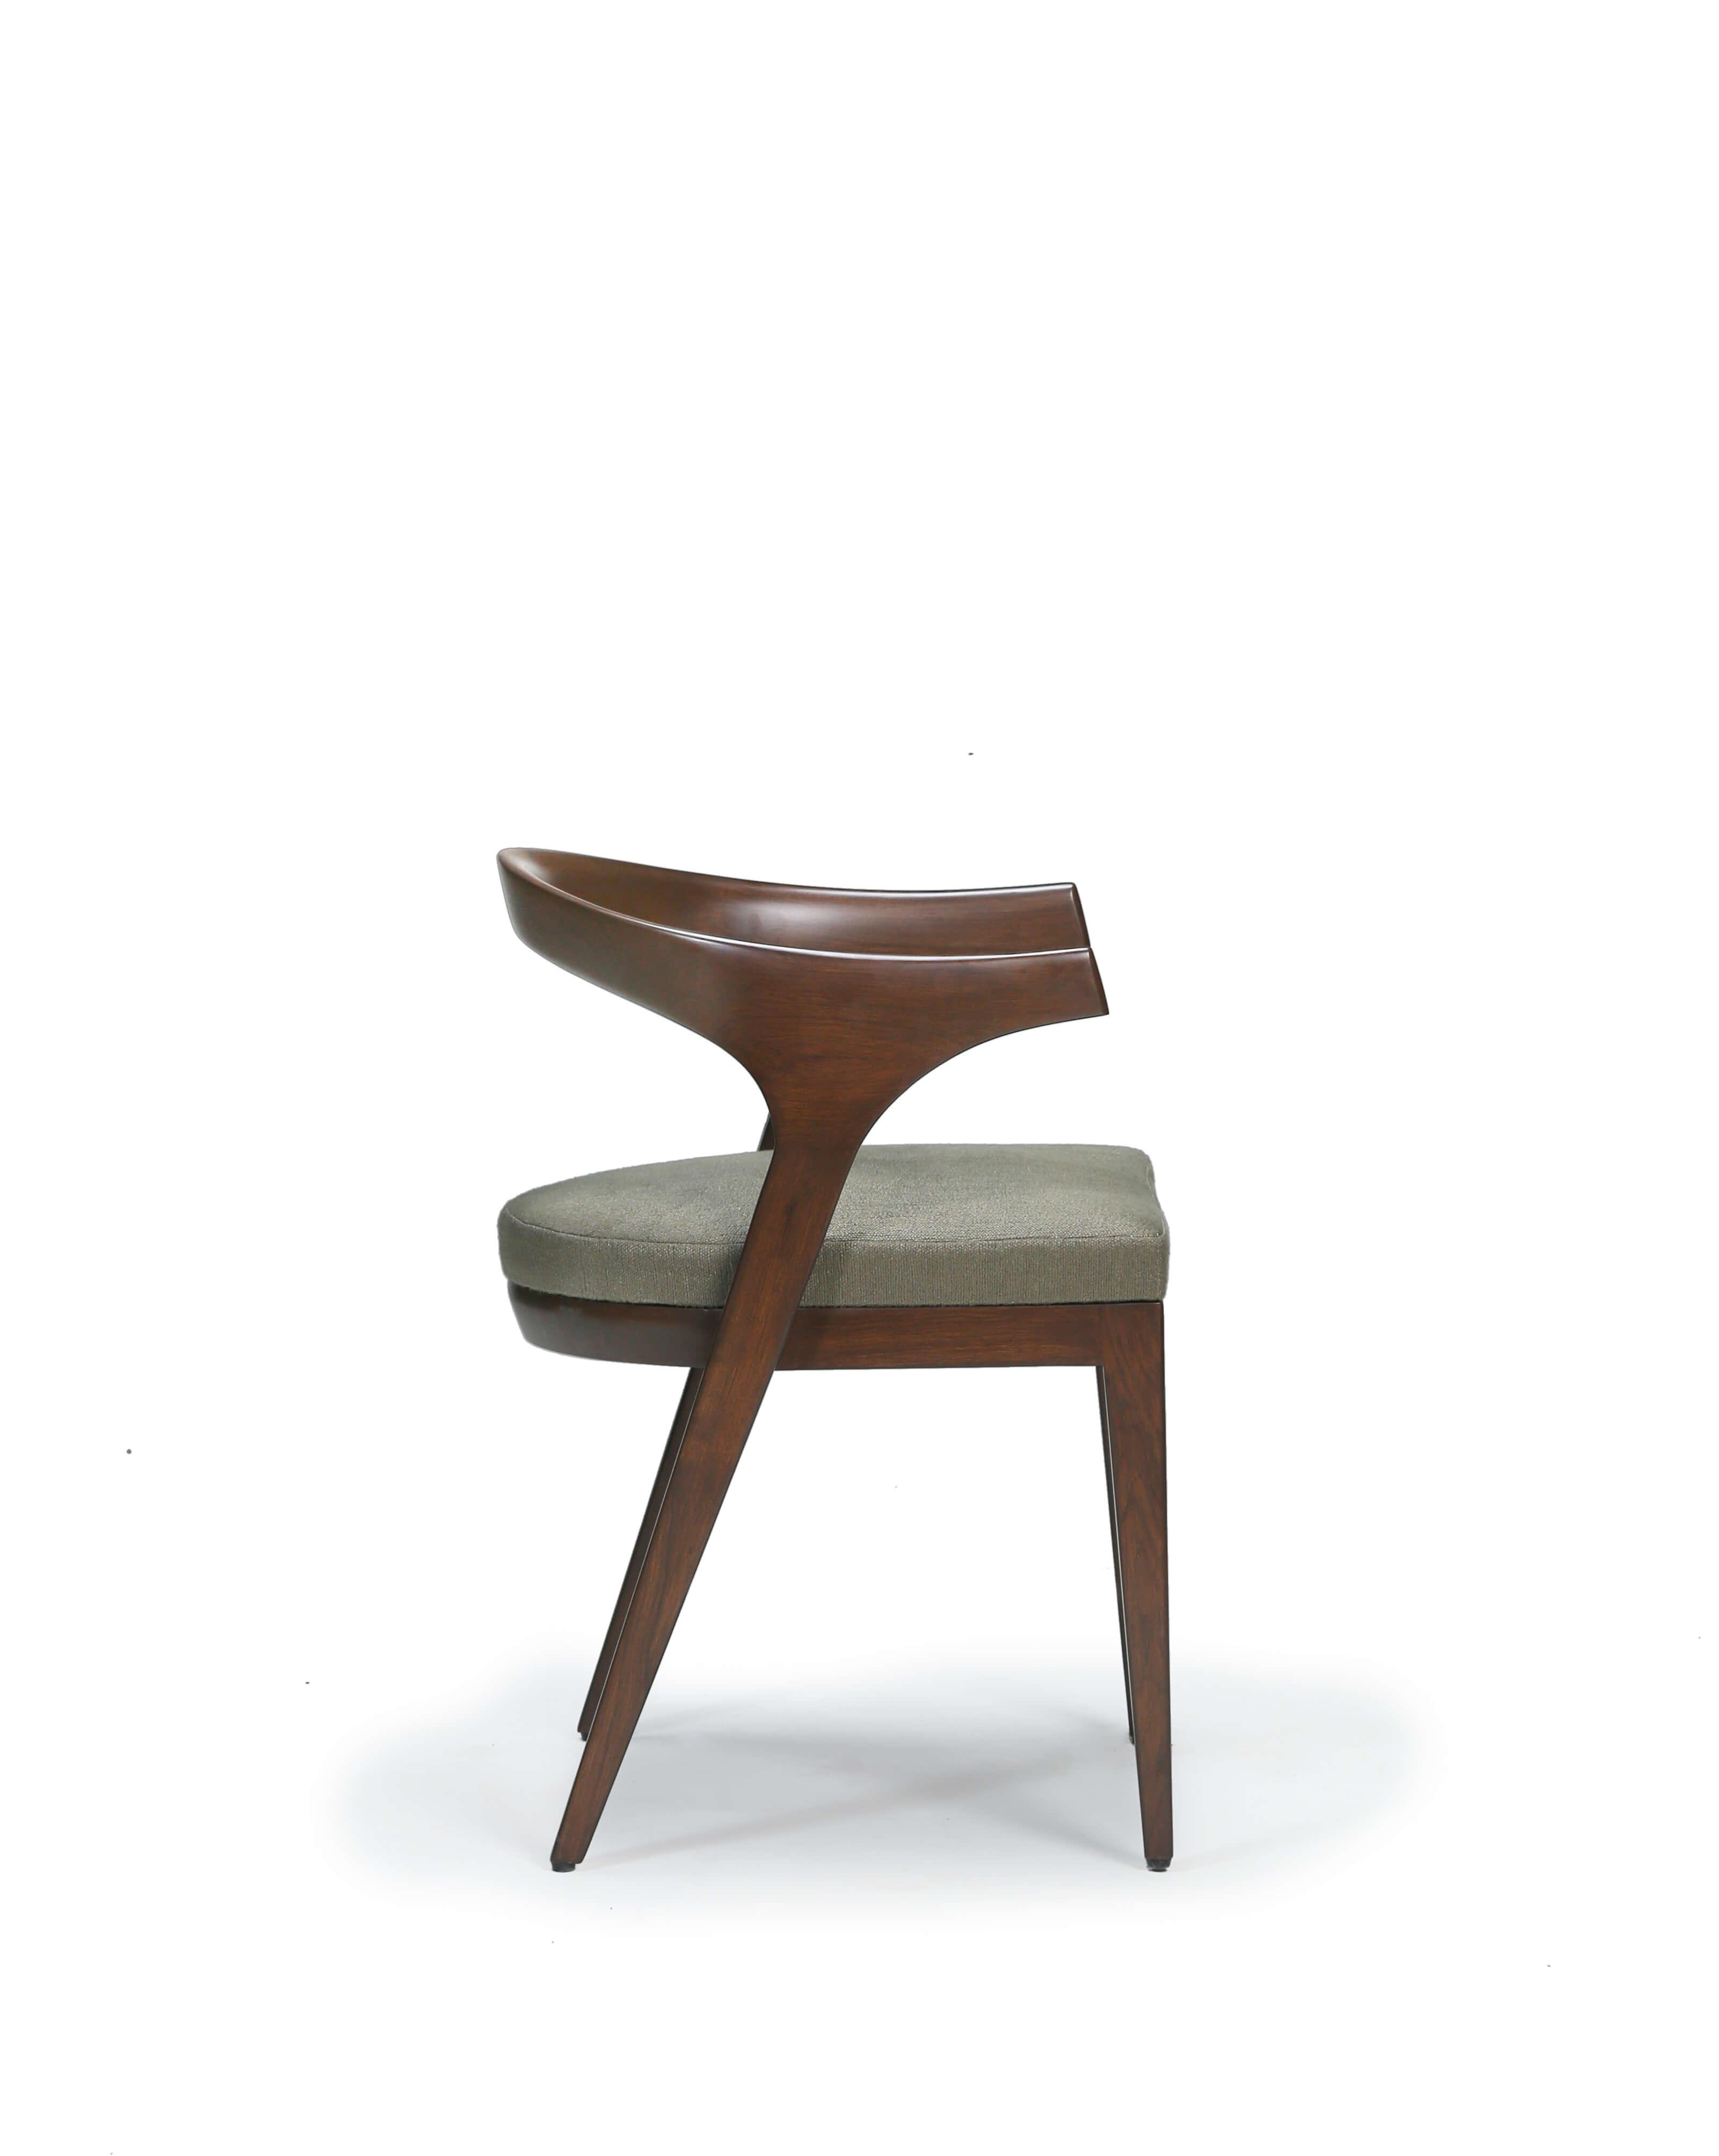 Horn chair (2)